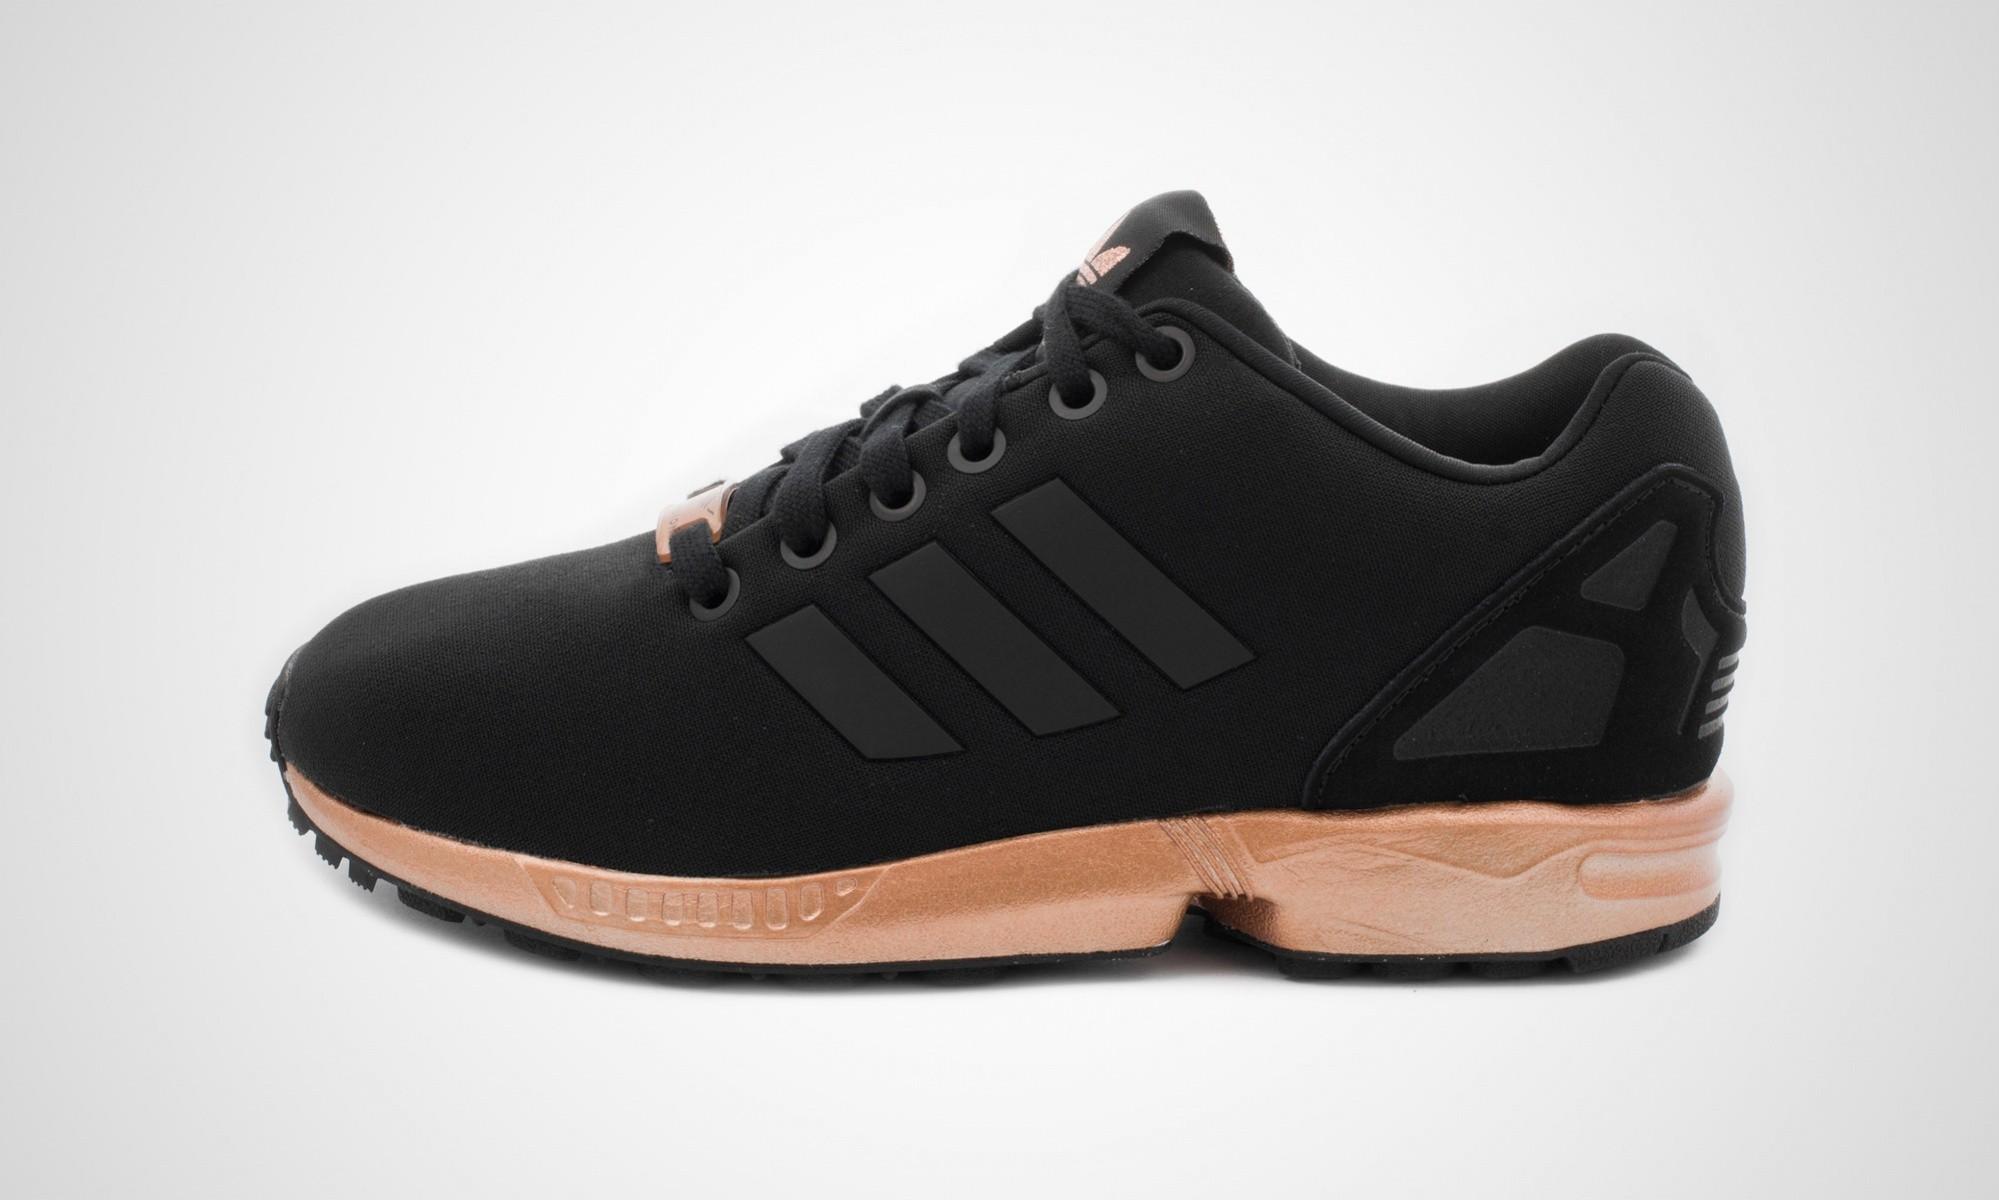 adidas zx flux femmes or